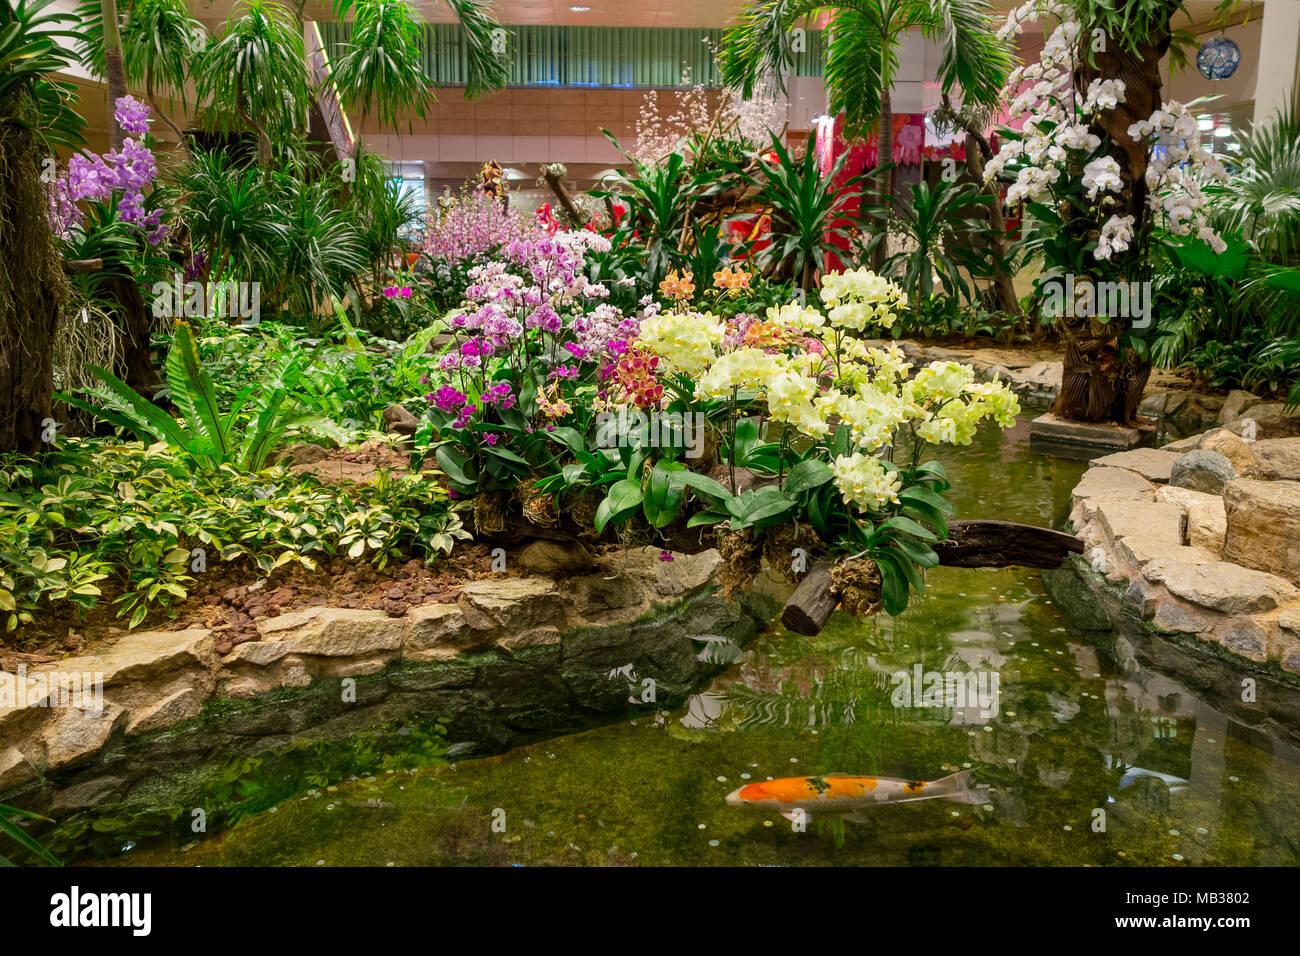 Best Indoor Garten In Singapur Contemporary - Amazing Home Ideas ...